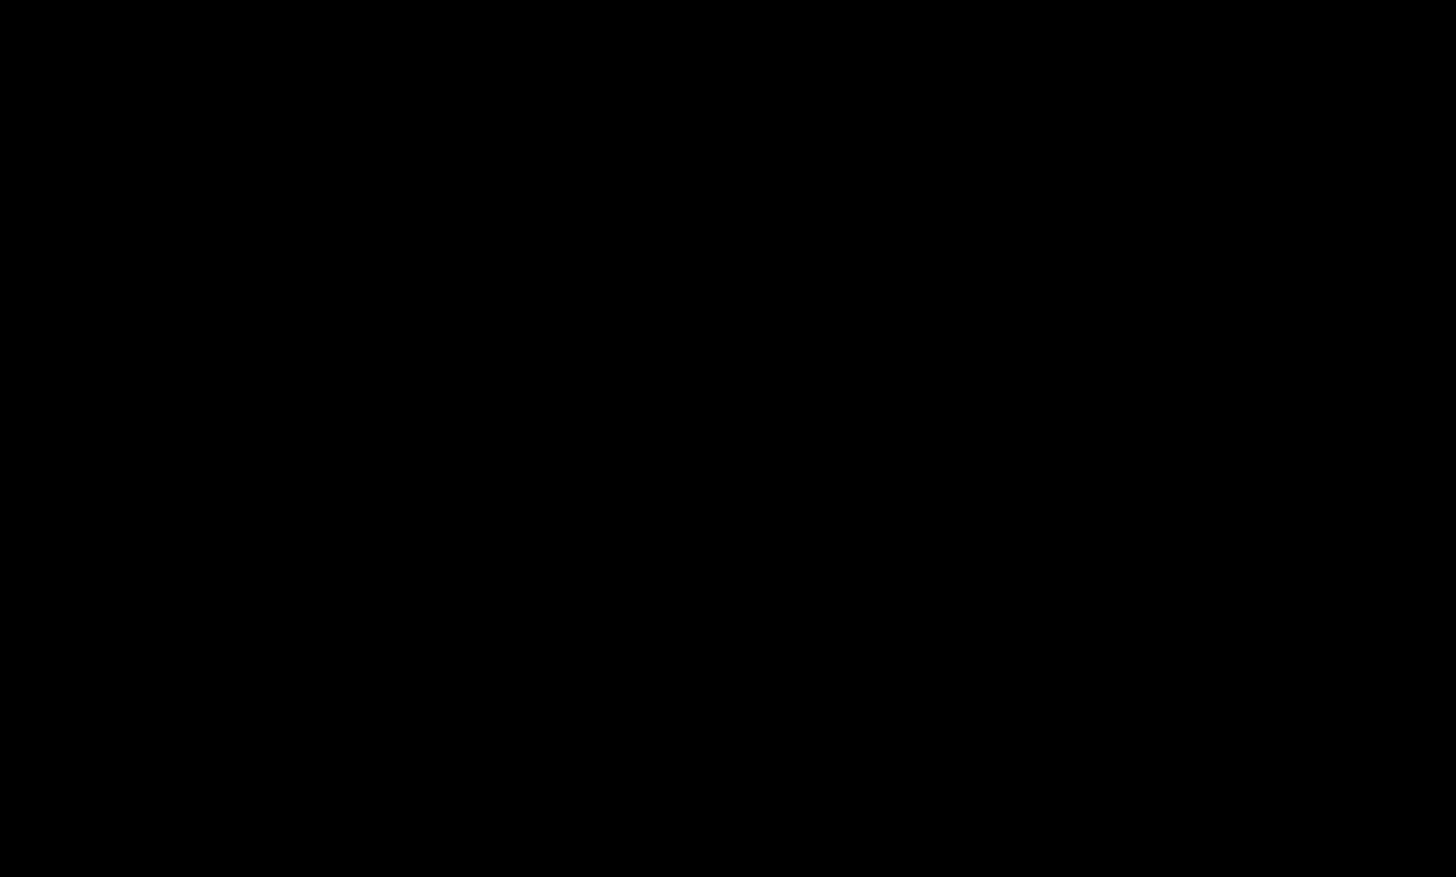 Bis-MAL-Lysine-dPEG®₄-TFP ester